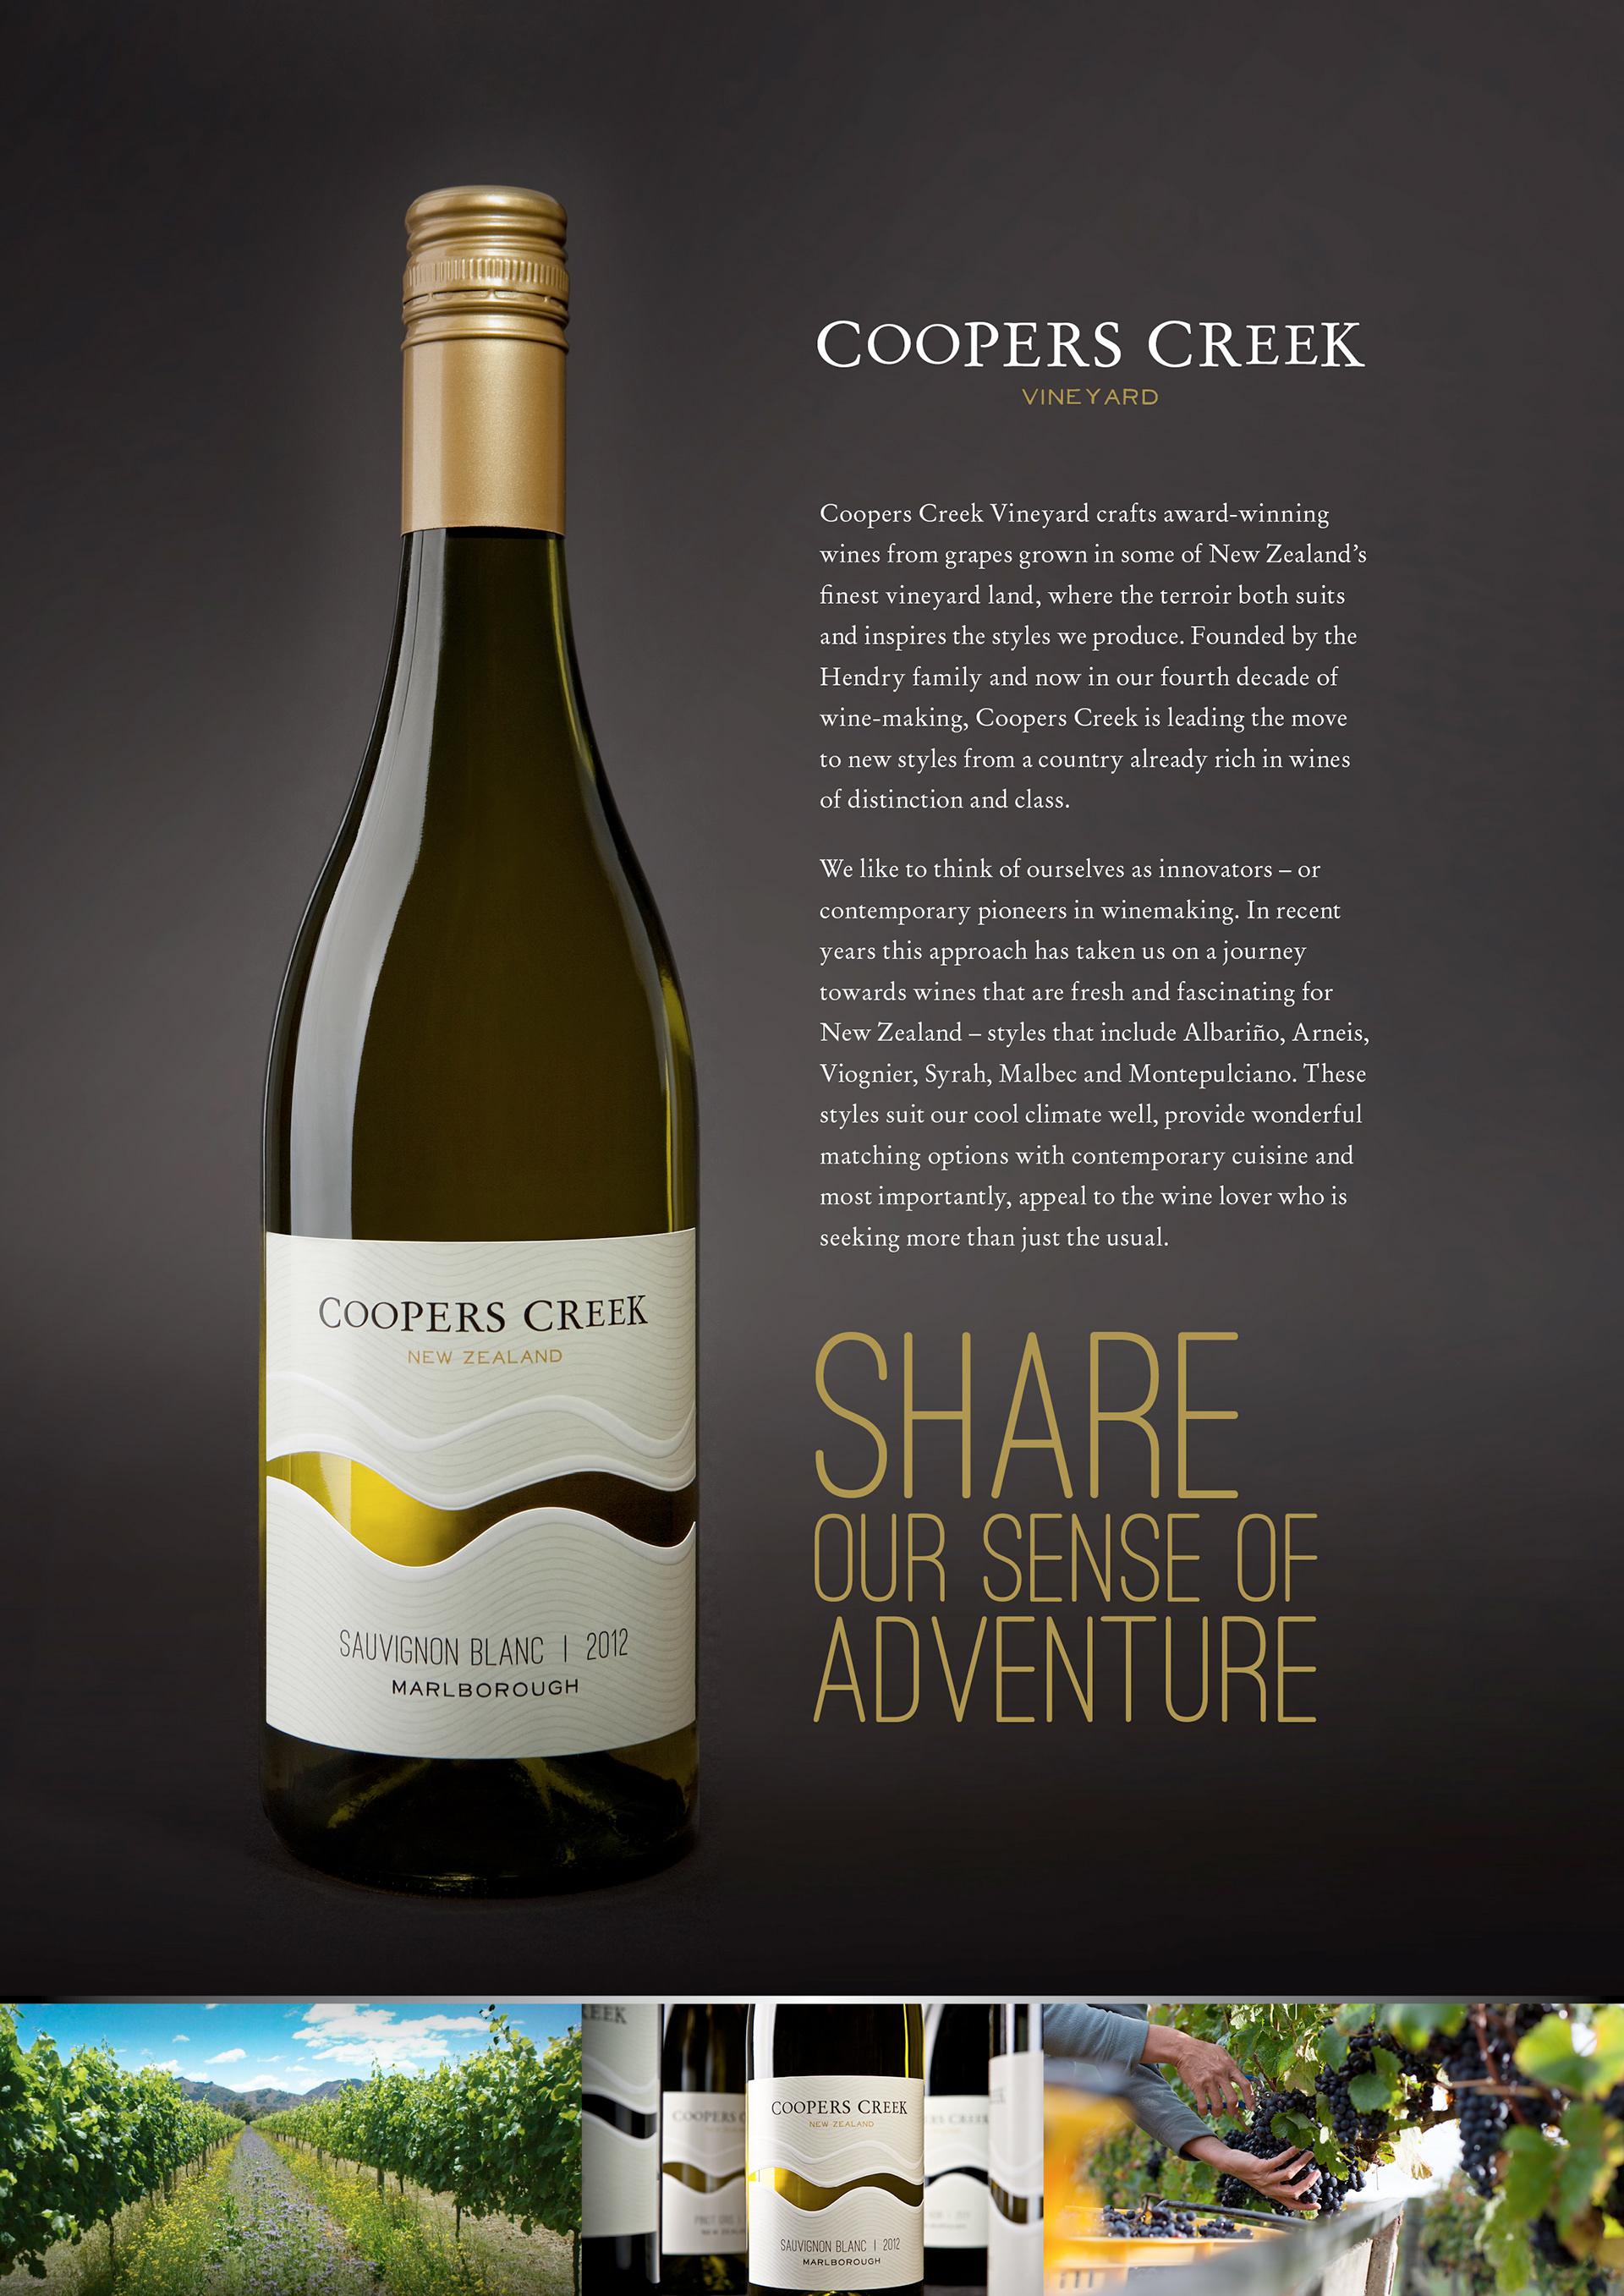 coopers creek wine management essay